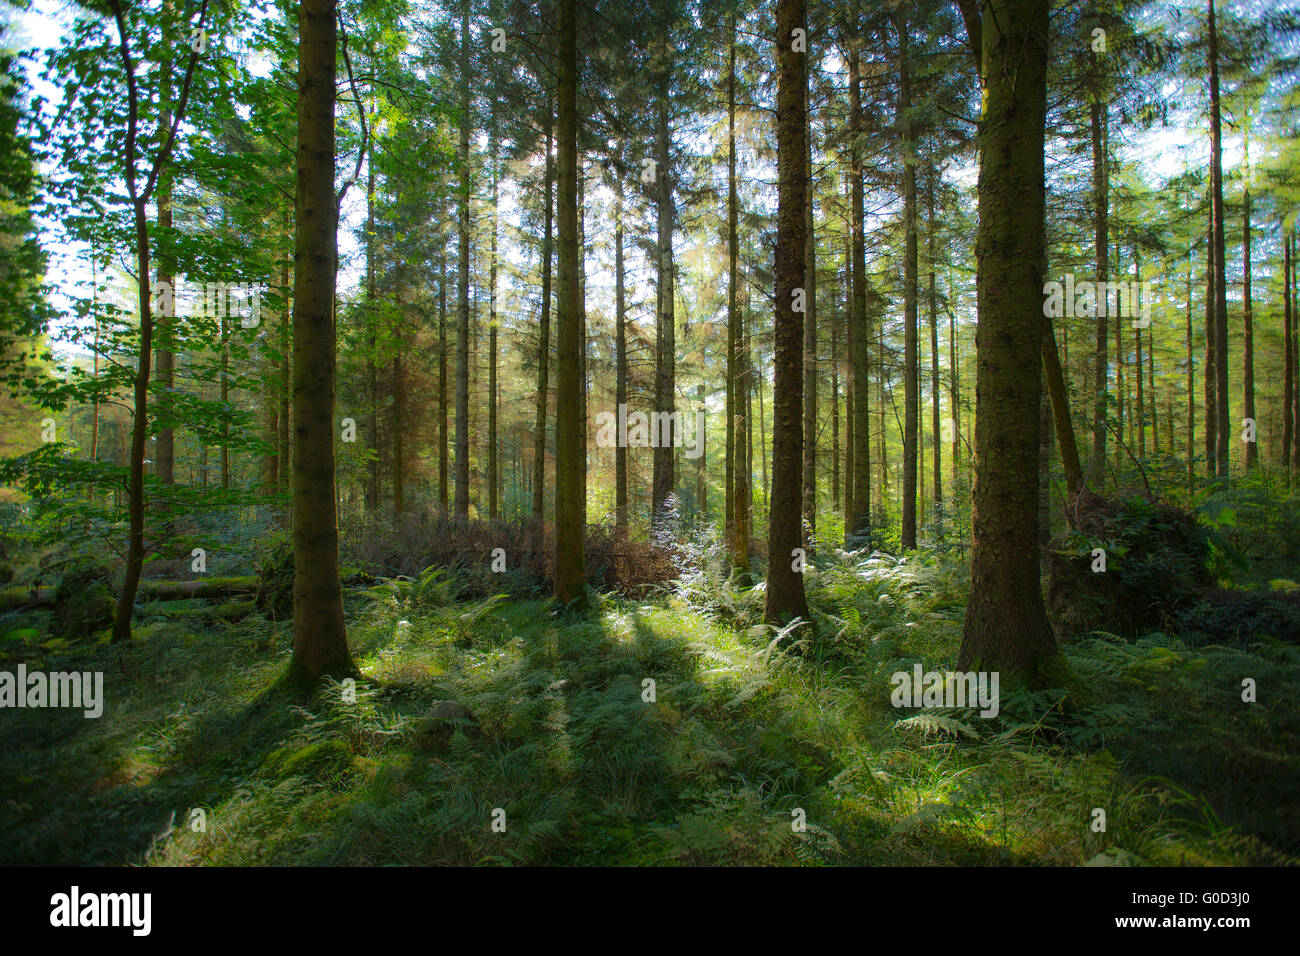 Sun dappled through trees in Craigieburn Forest Scotland - Stock Image